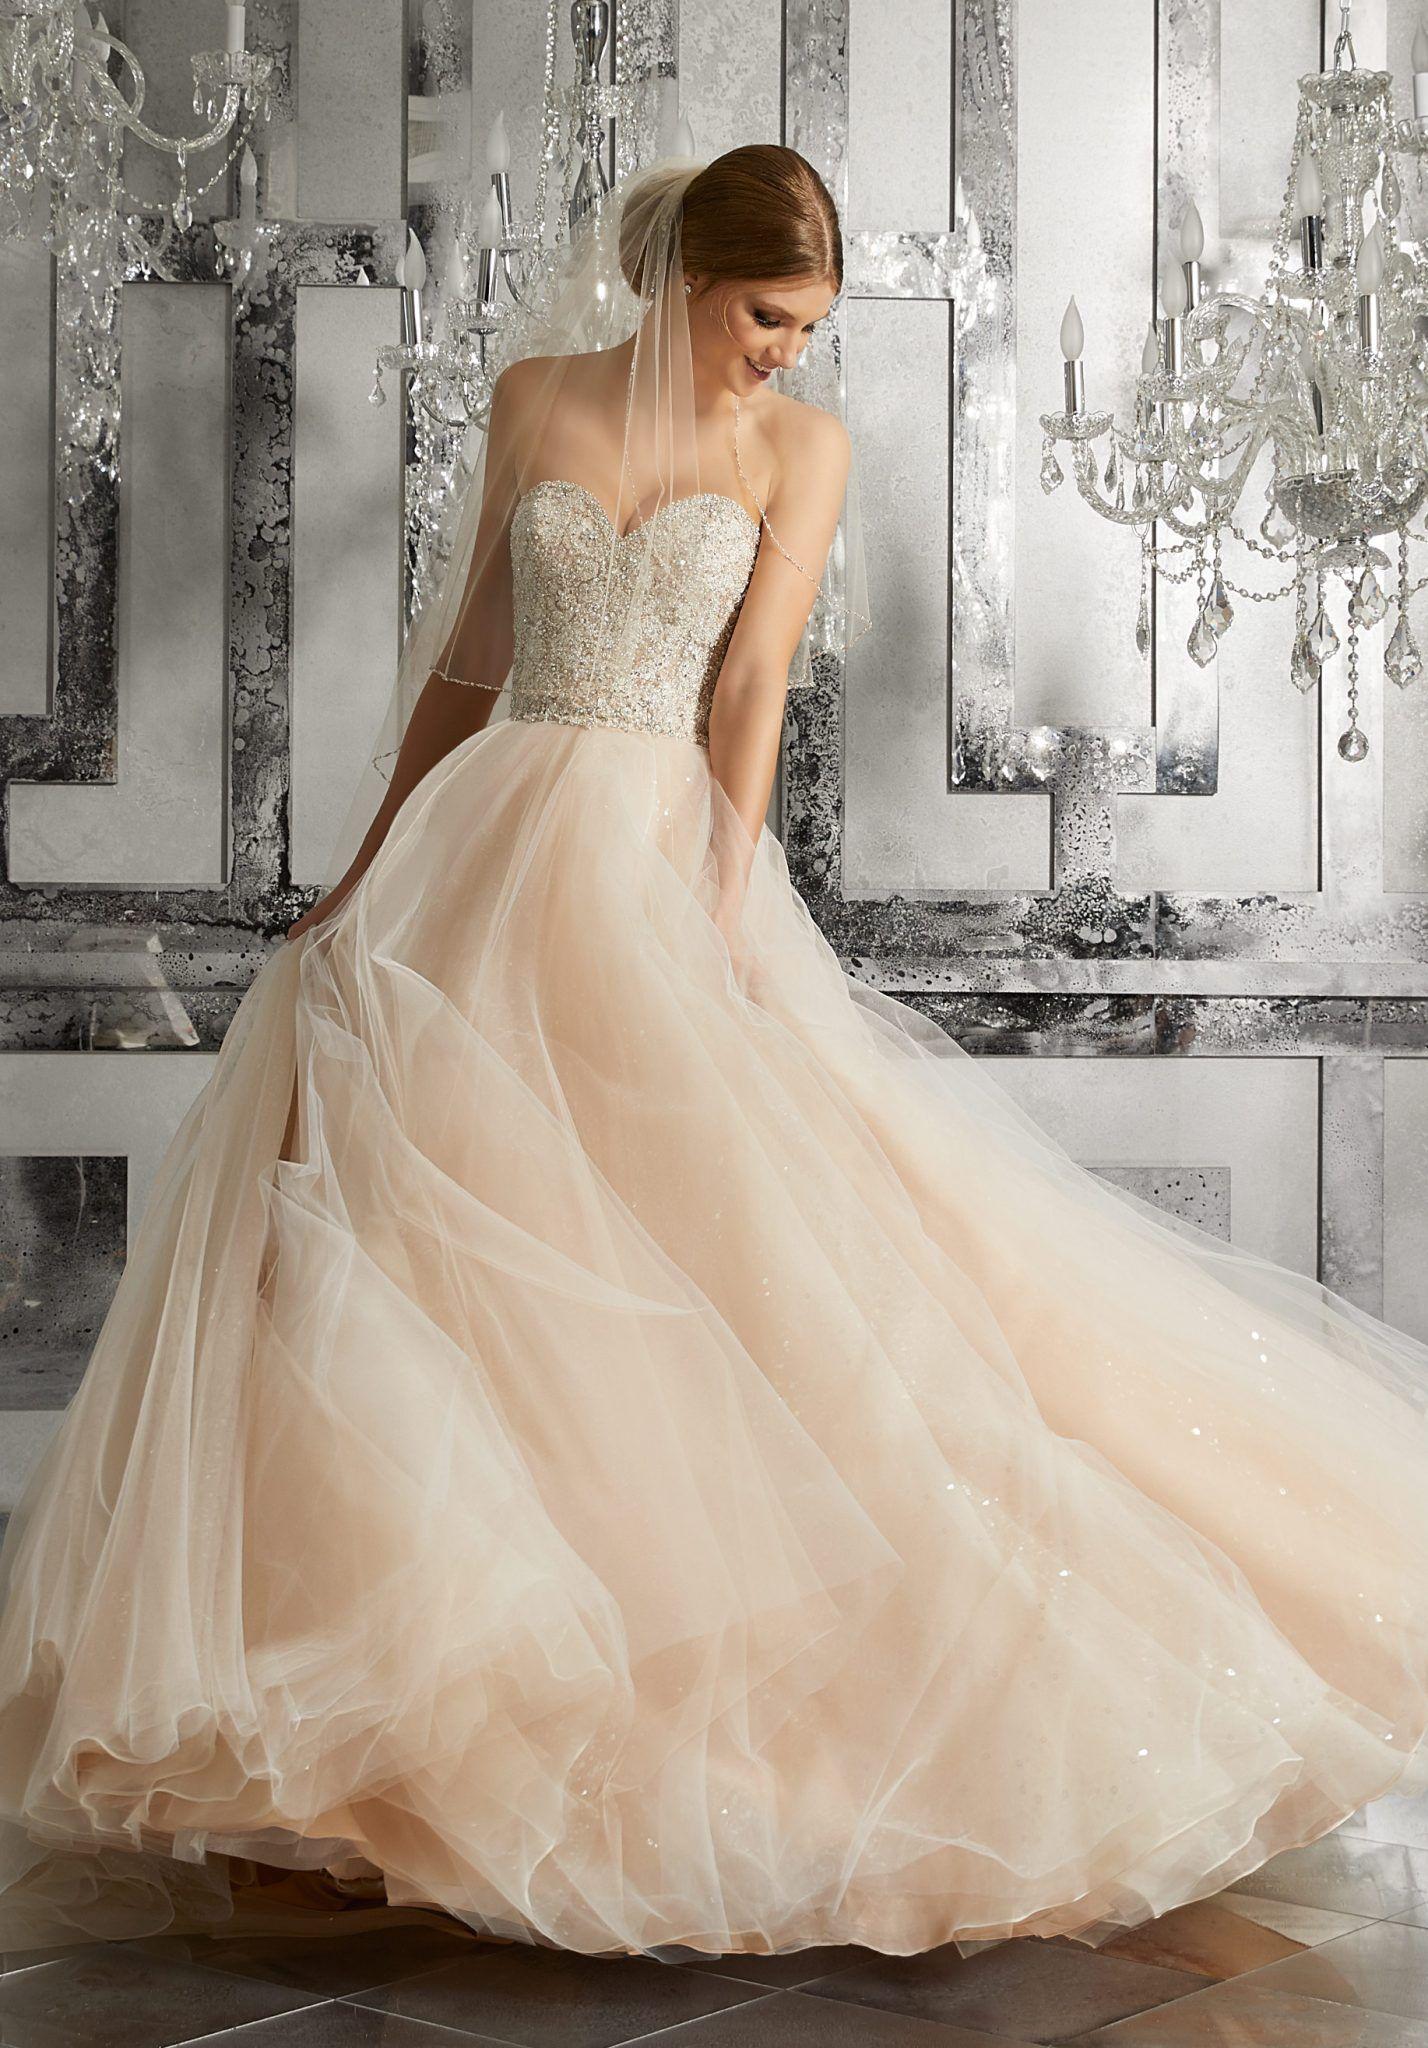 Marcia Wedding Dress Morilee Italy | Vestiti da cerimonia